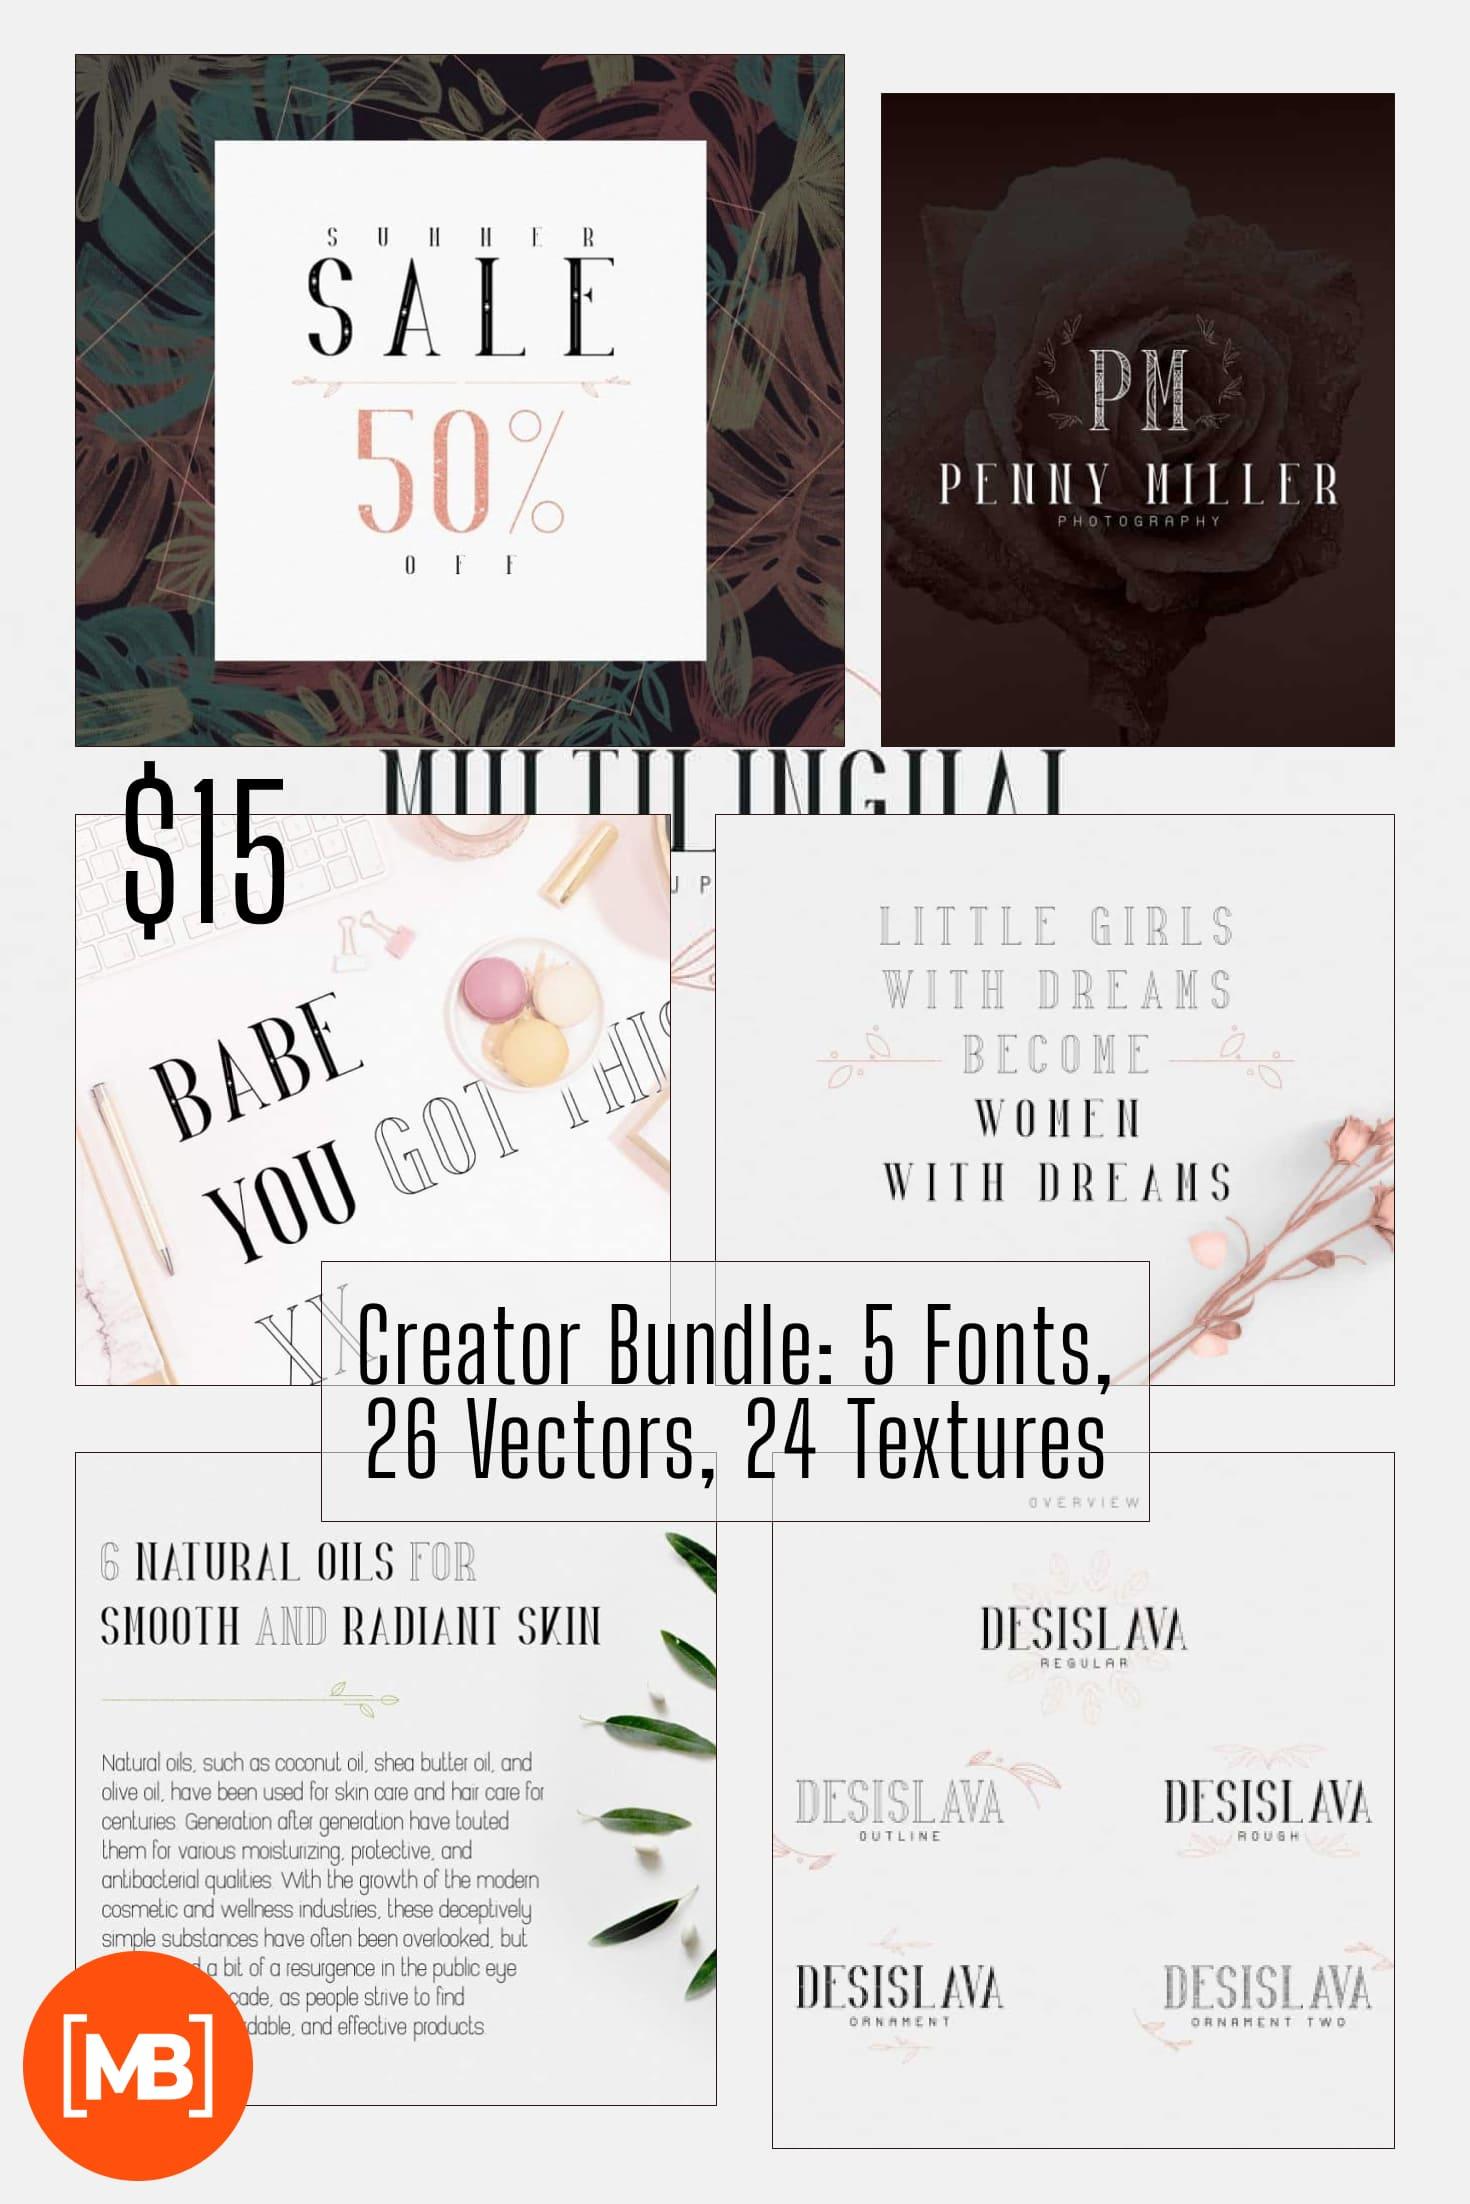 Pinterest Image: Creator Bundle: 5 Fonts, 26 Vectors, 24 Textures.